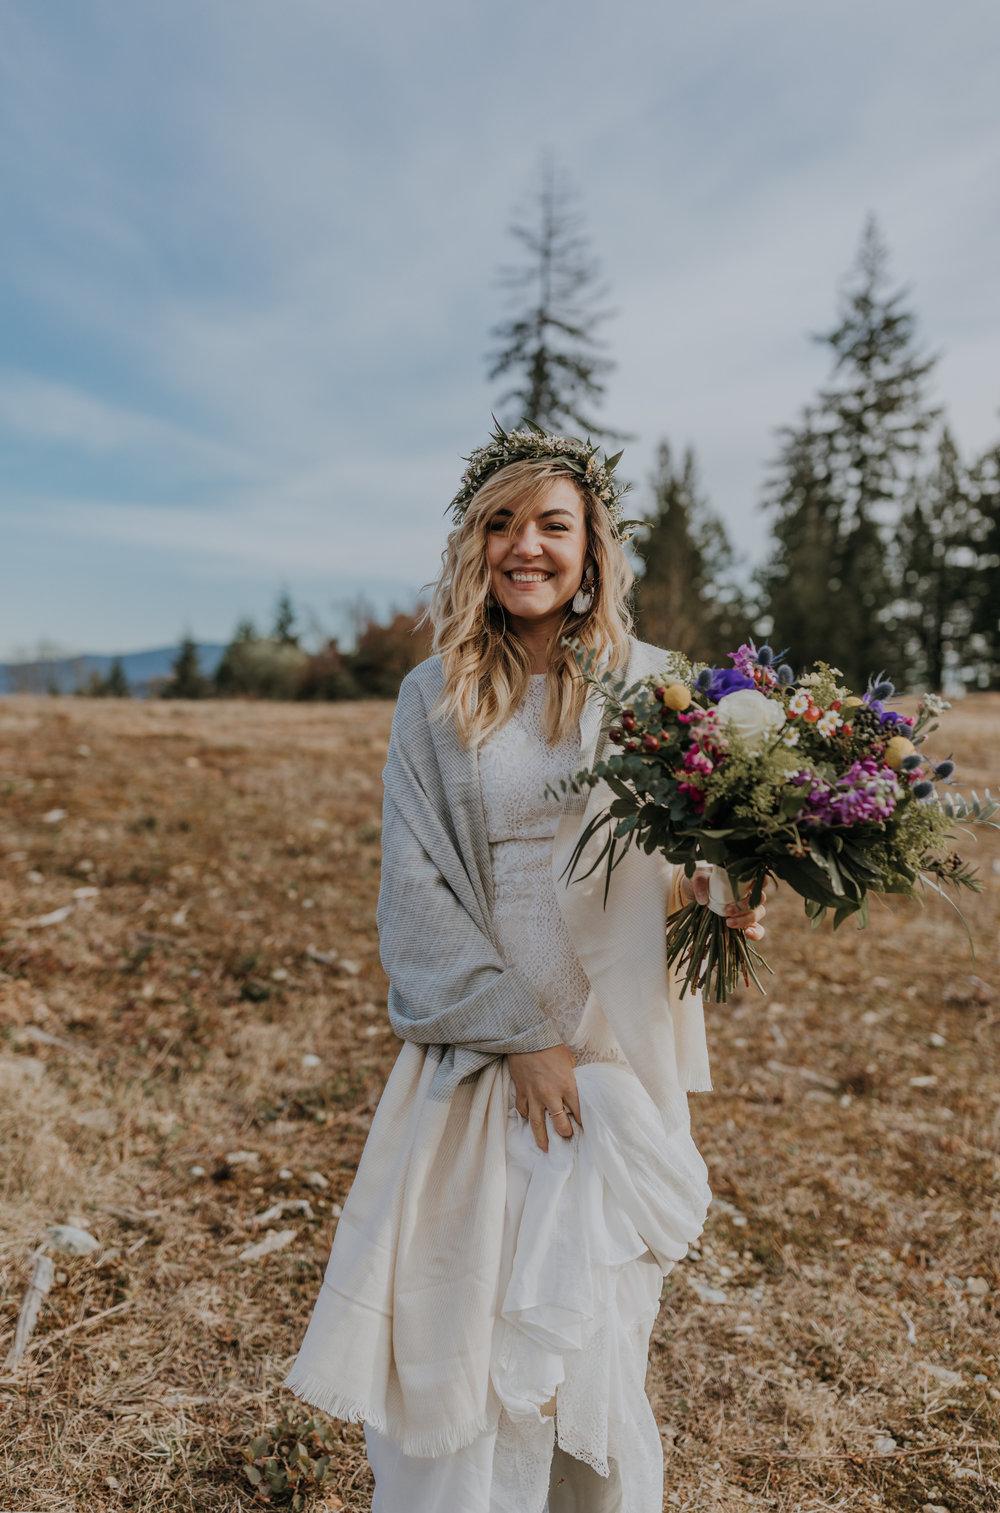 Sunshine Coast Wedding Photos - Mountain Wedding Photos - Sunshine Coast Wedding Photographer - Vancouver Wedding Photographer - Jennifer Picard297-1.JPG